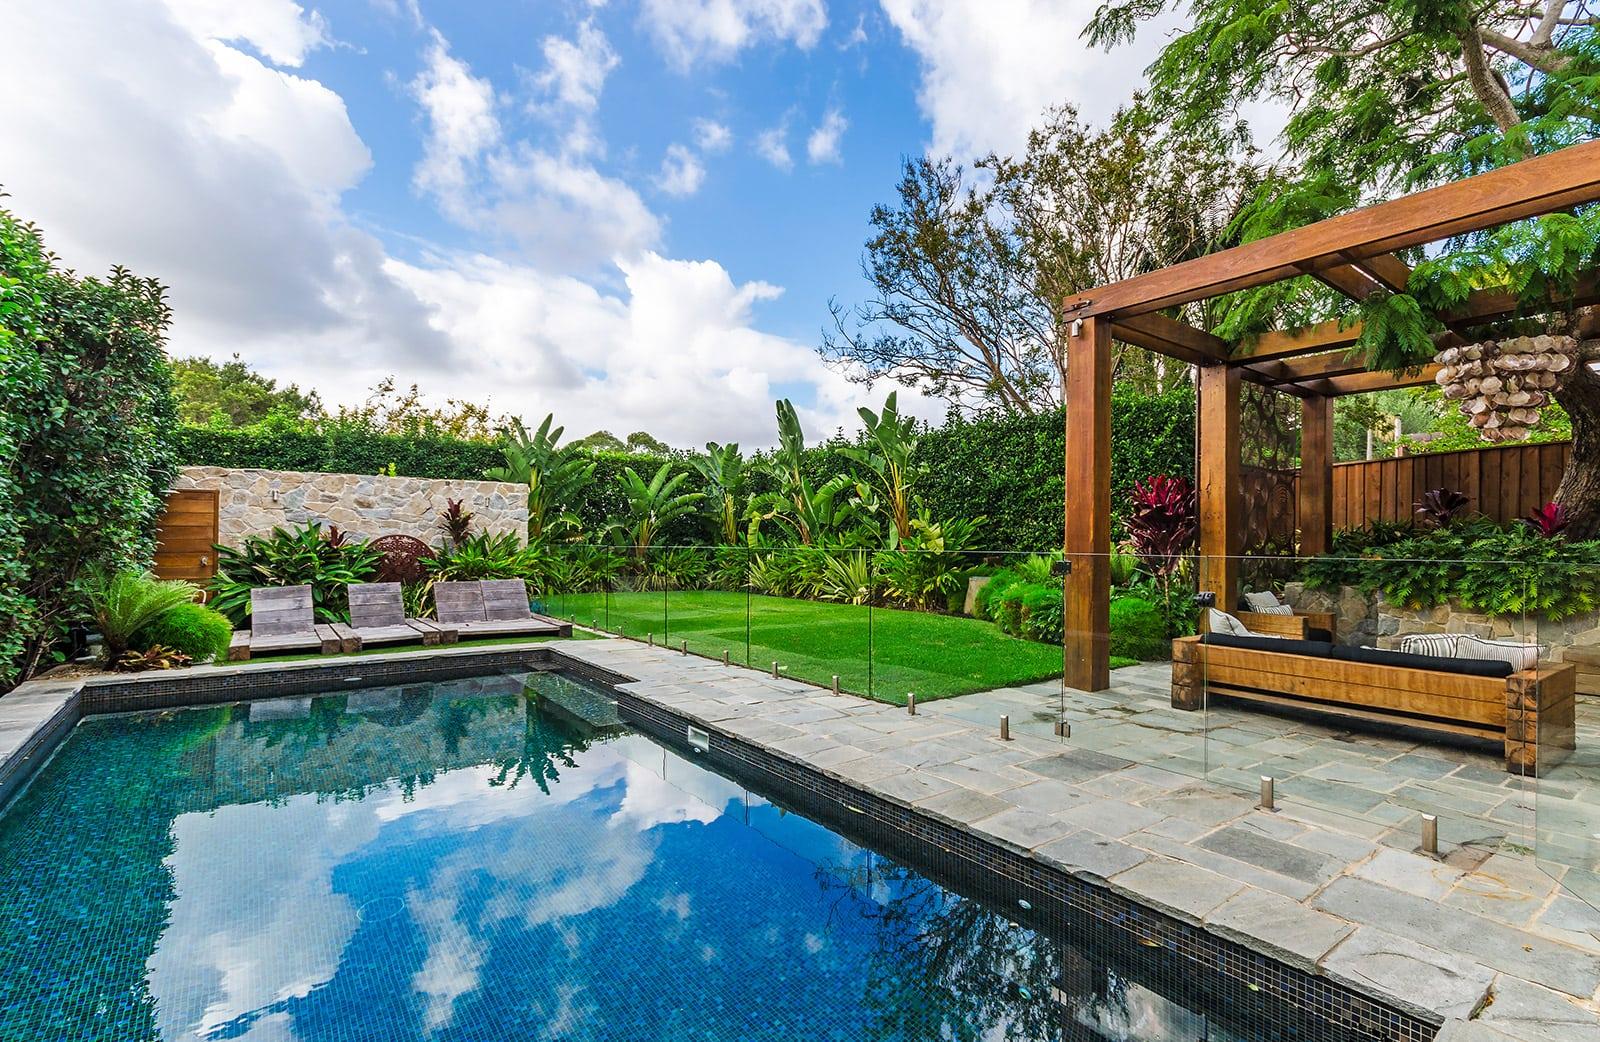 custom swimming pool builders san antonio shavano park hollywood park alamo heights stone oak